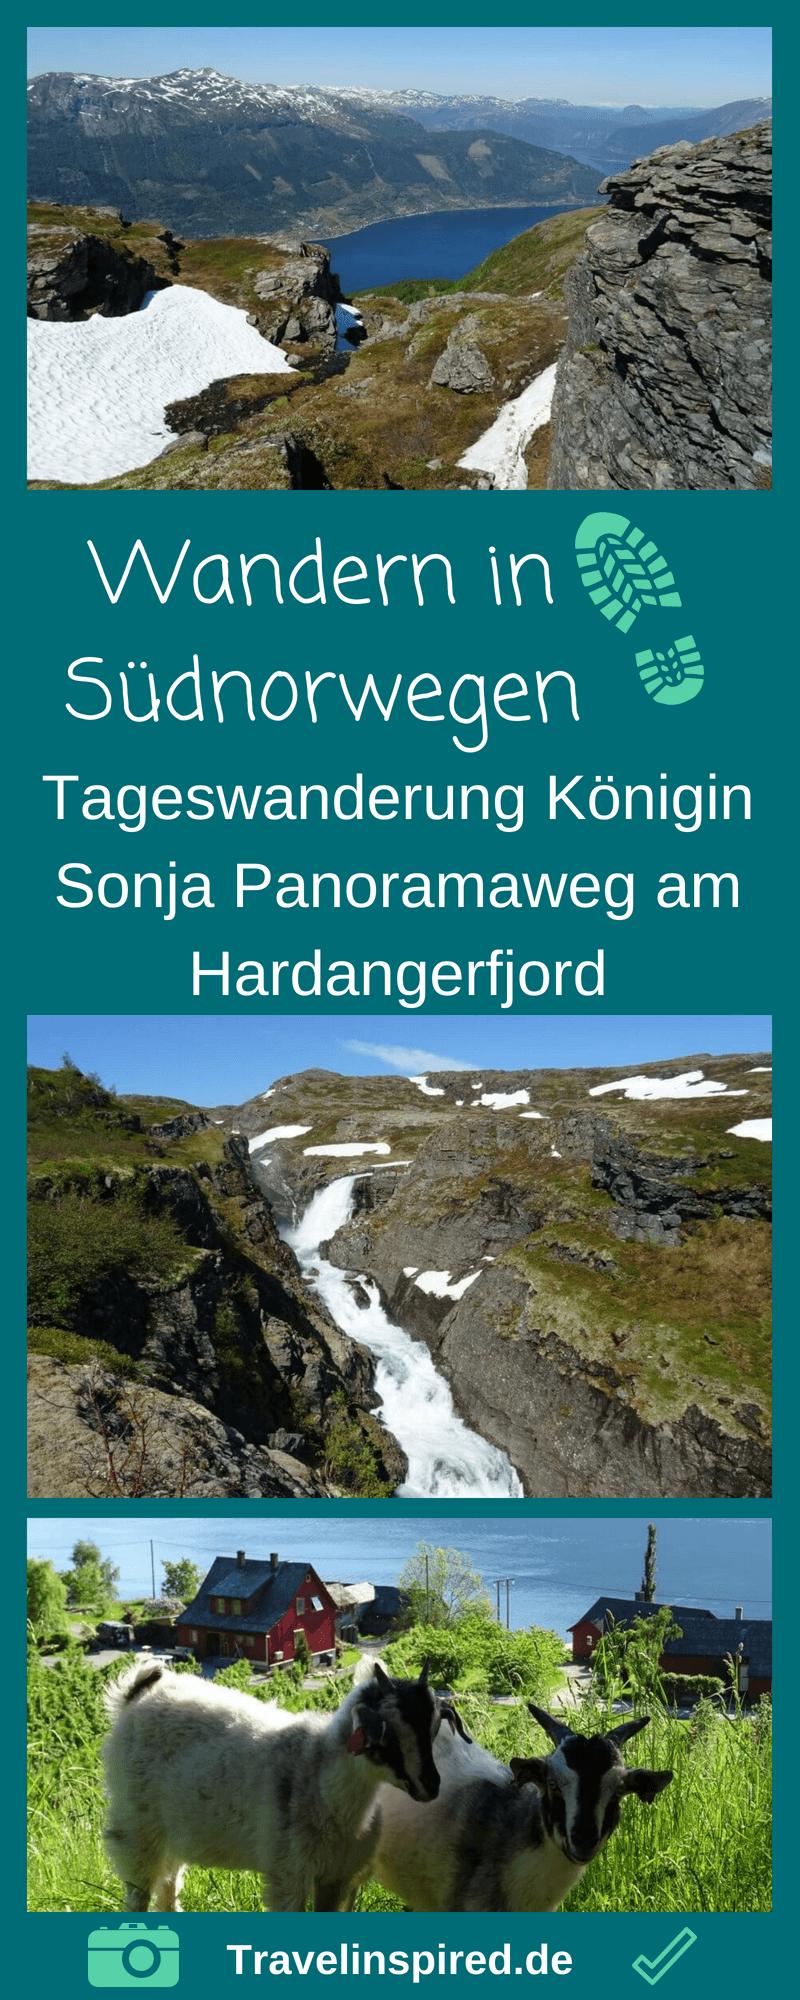 Photo of Hiking Hardangervidda: Queen Sonja panorama trail